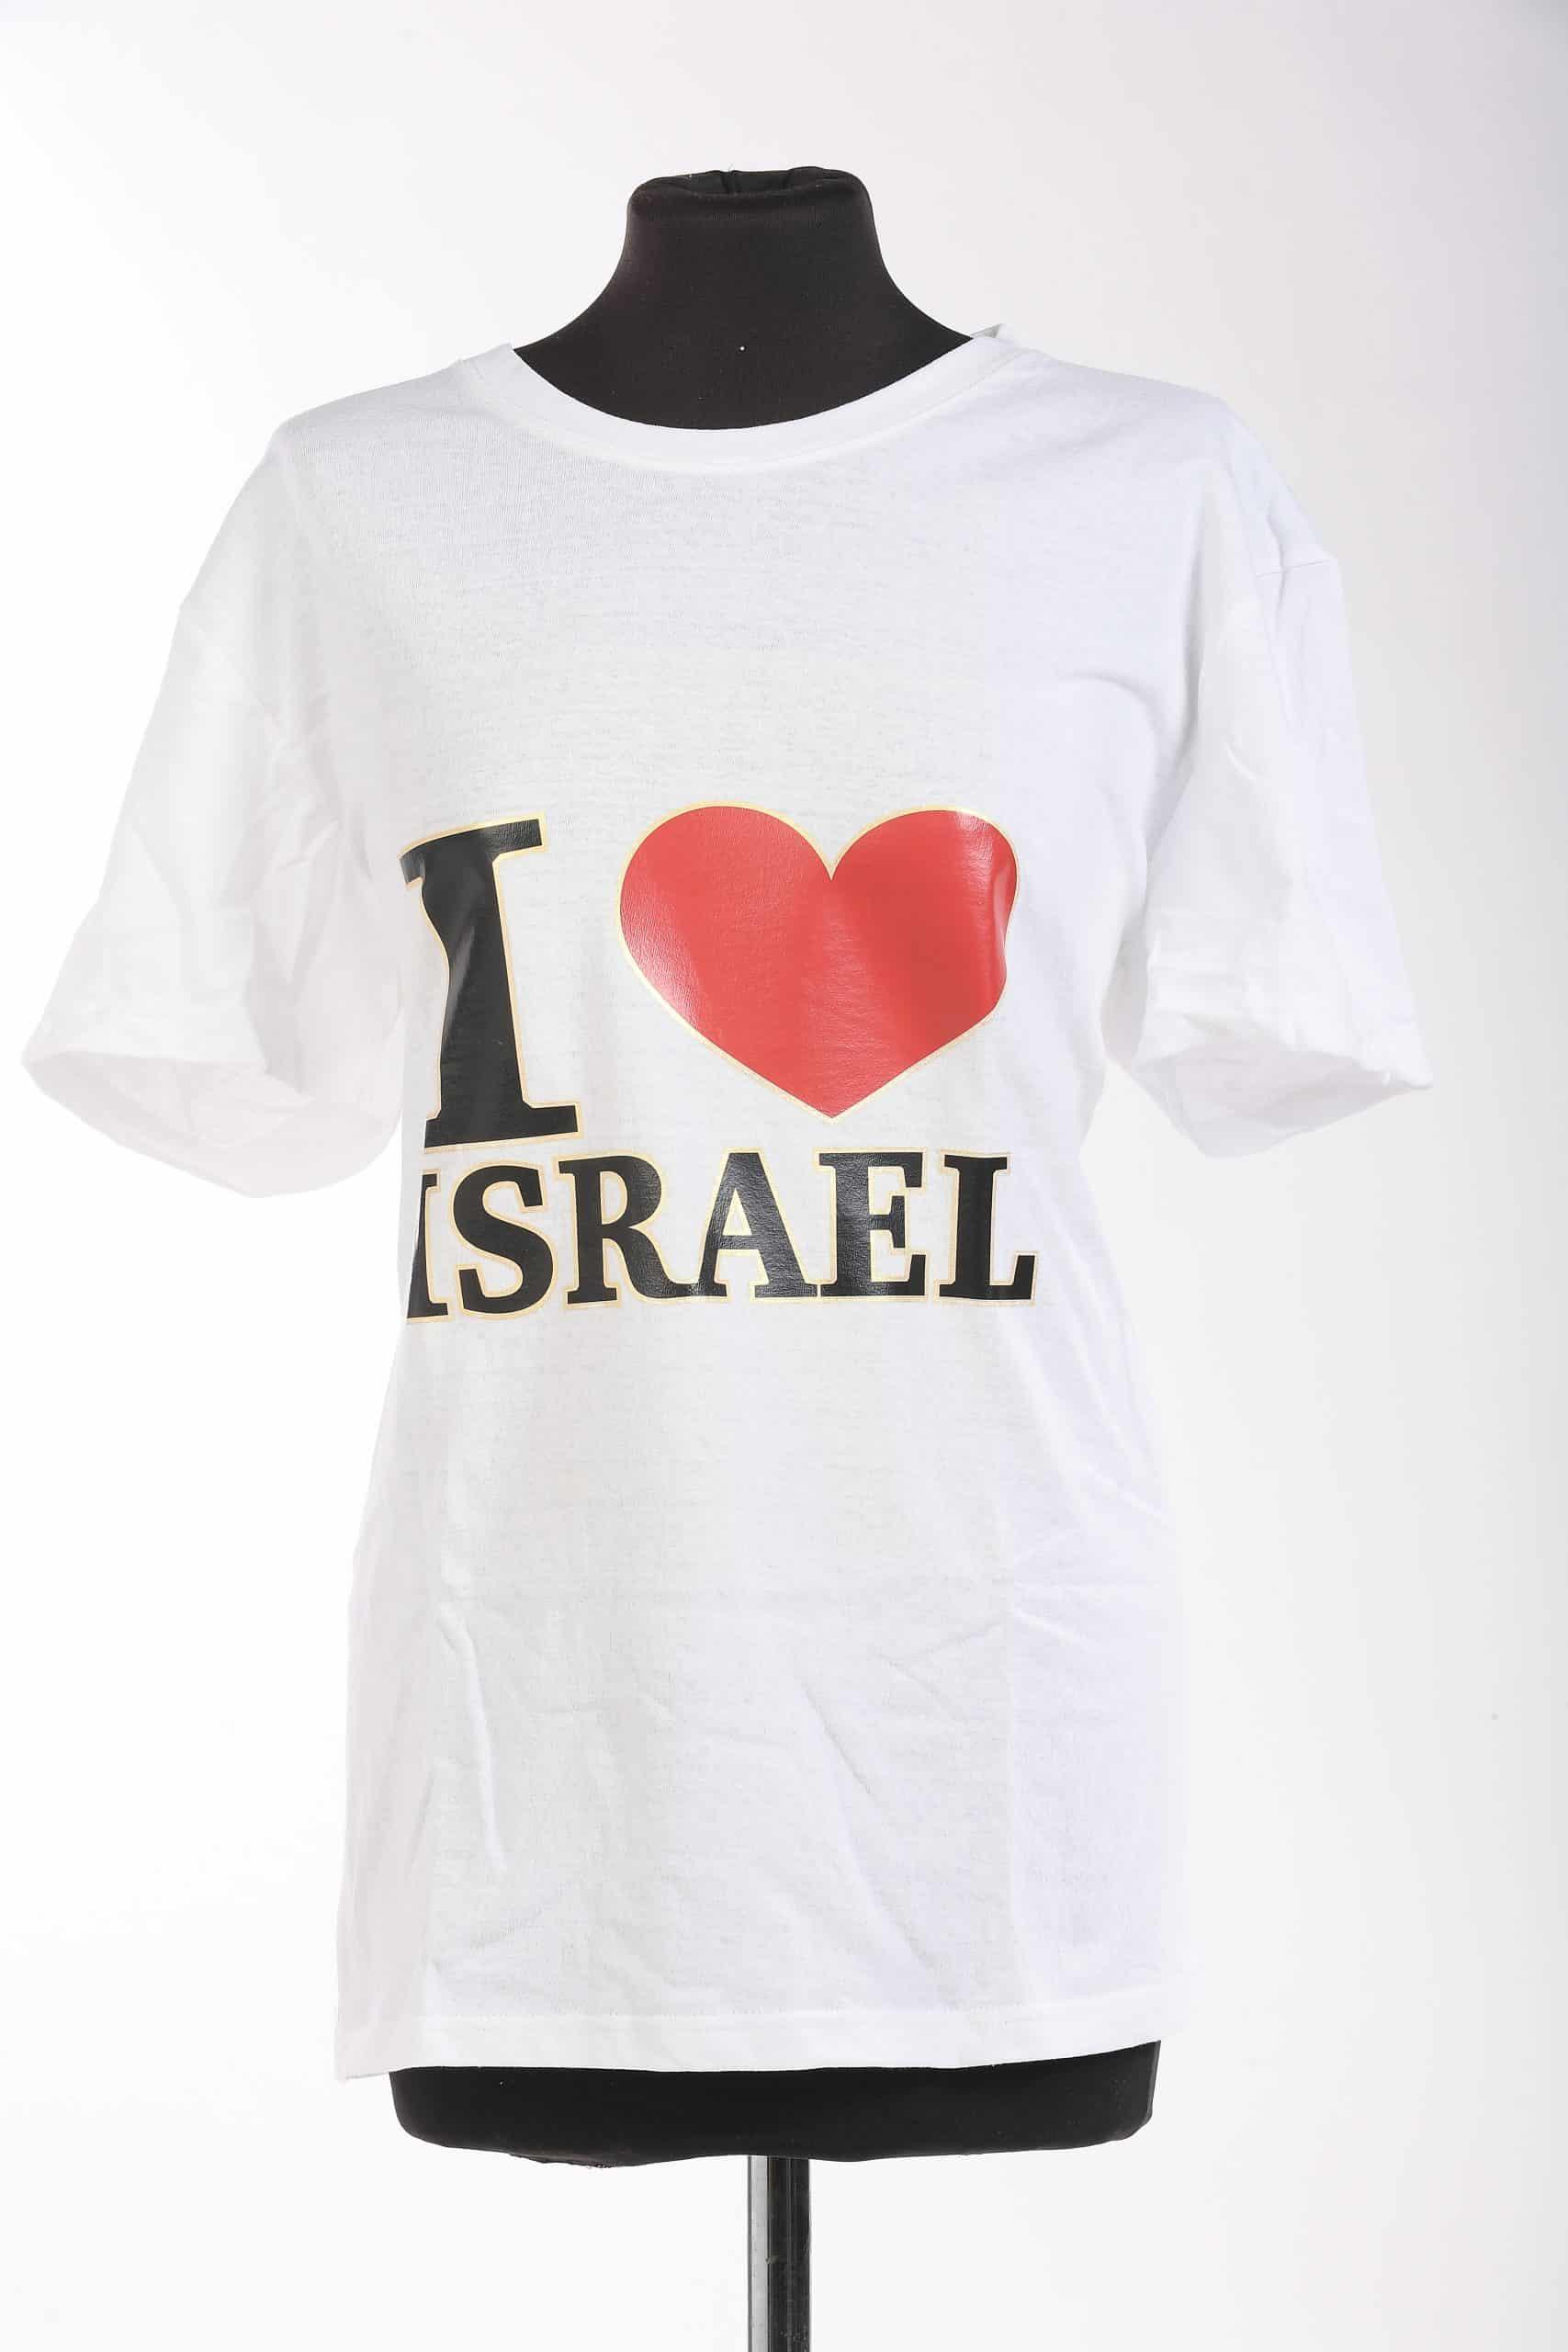 Holy Land T Shirts - I love israel (S-XXL)